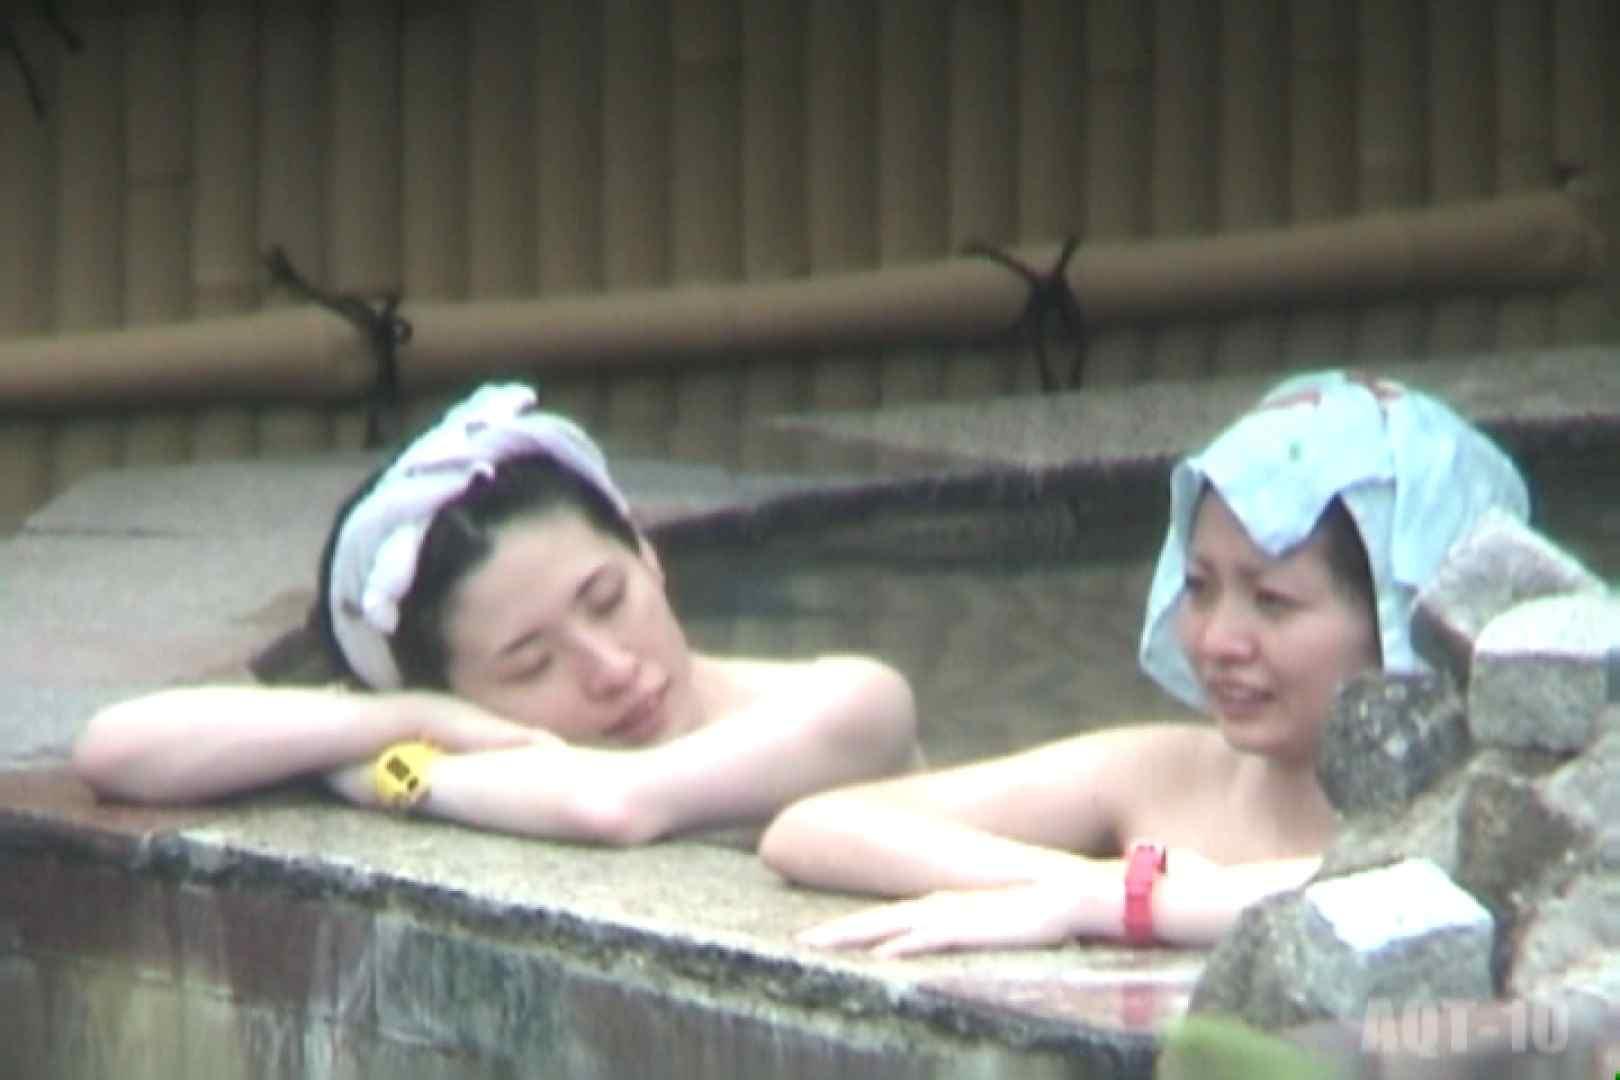 Aquaな露天風呂Vol.793 露天 | OLセックス  94画像 34